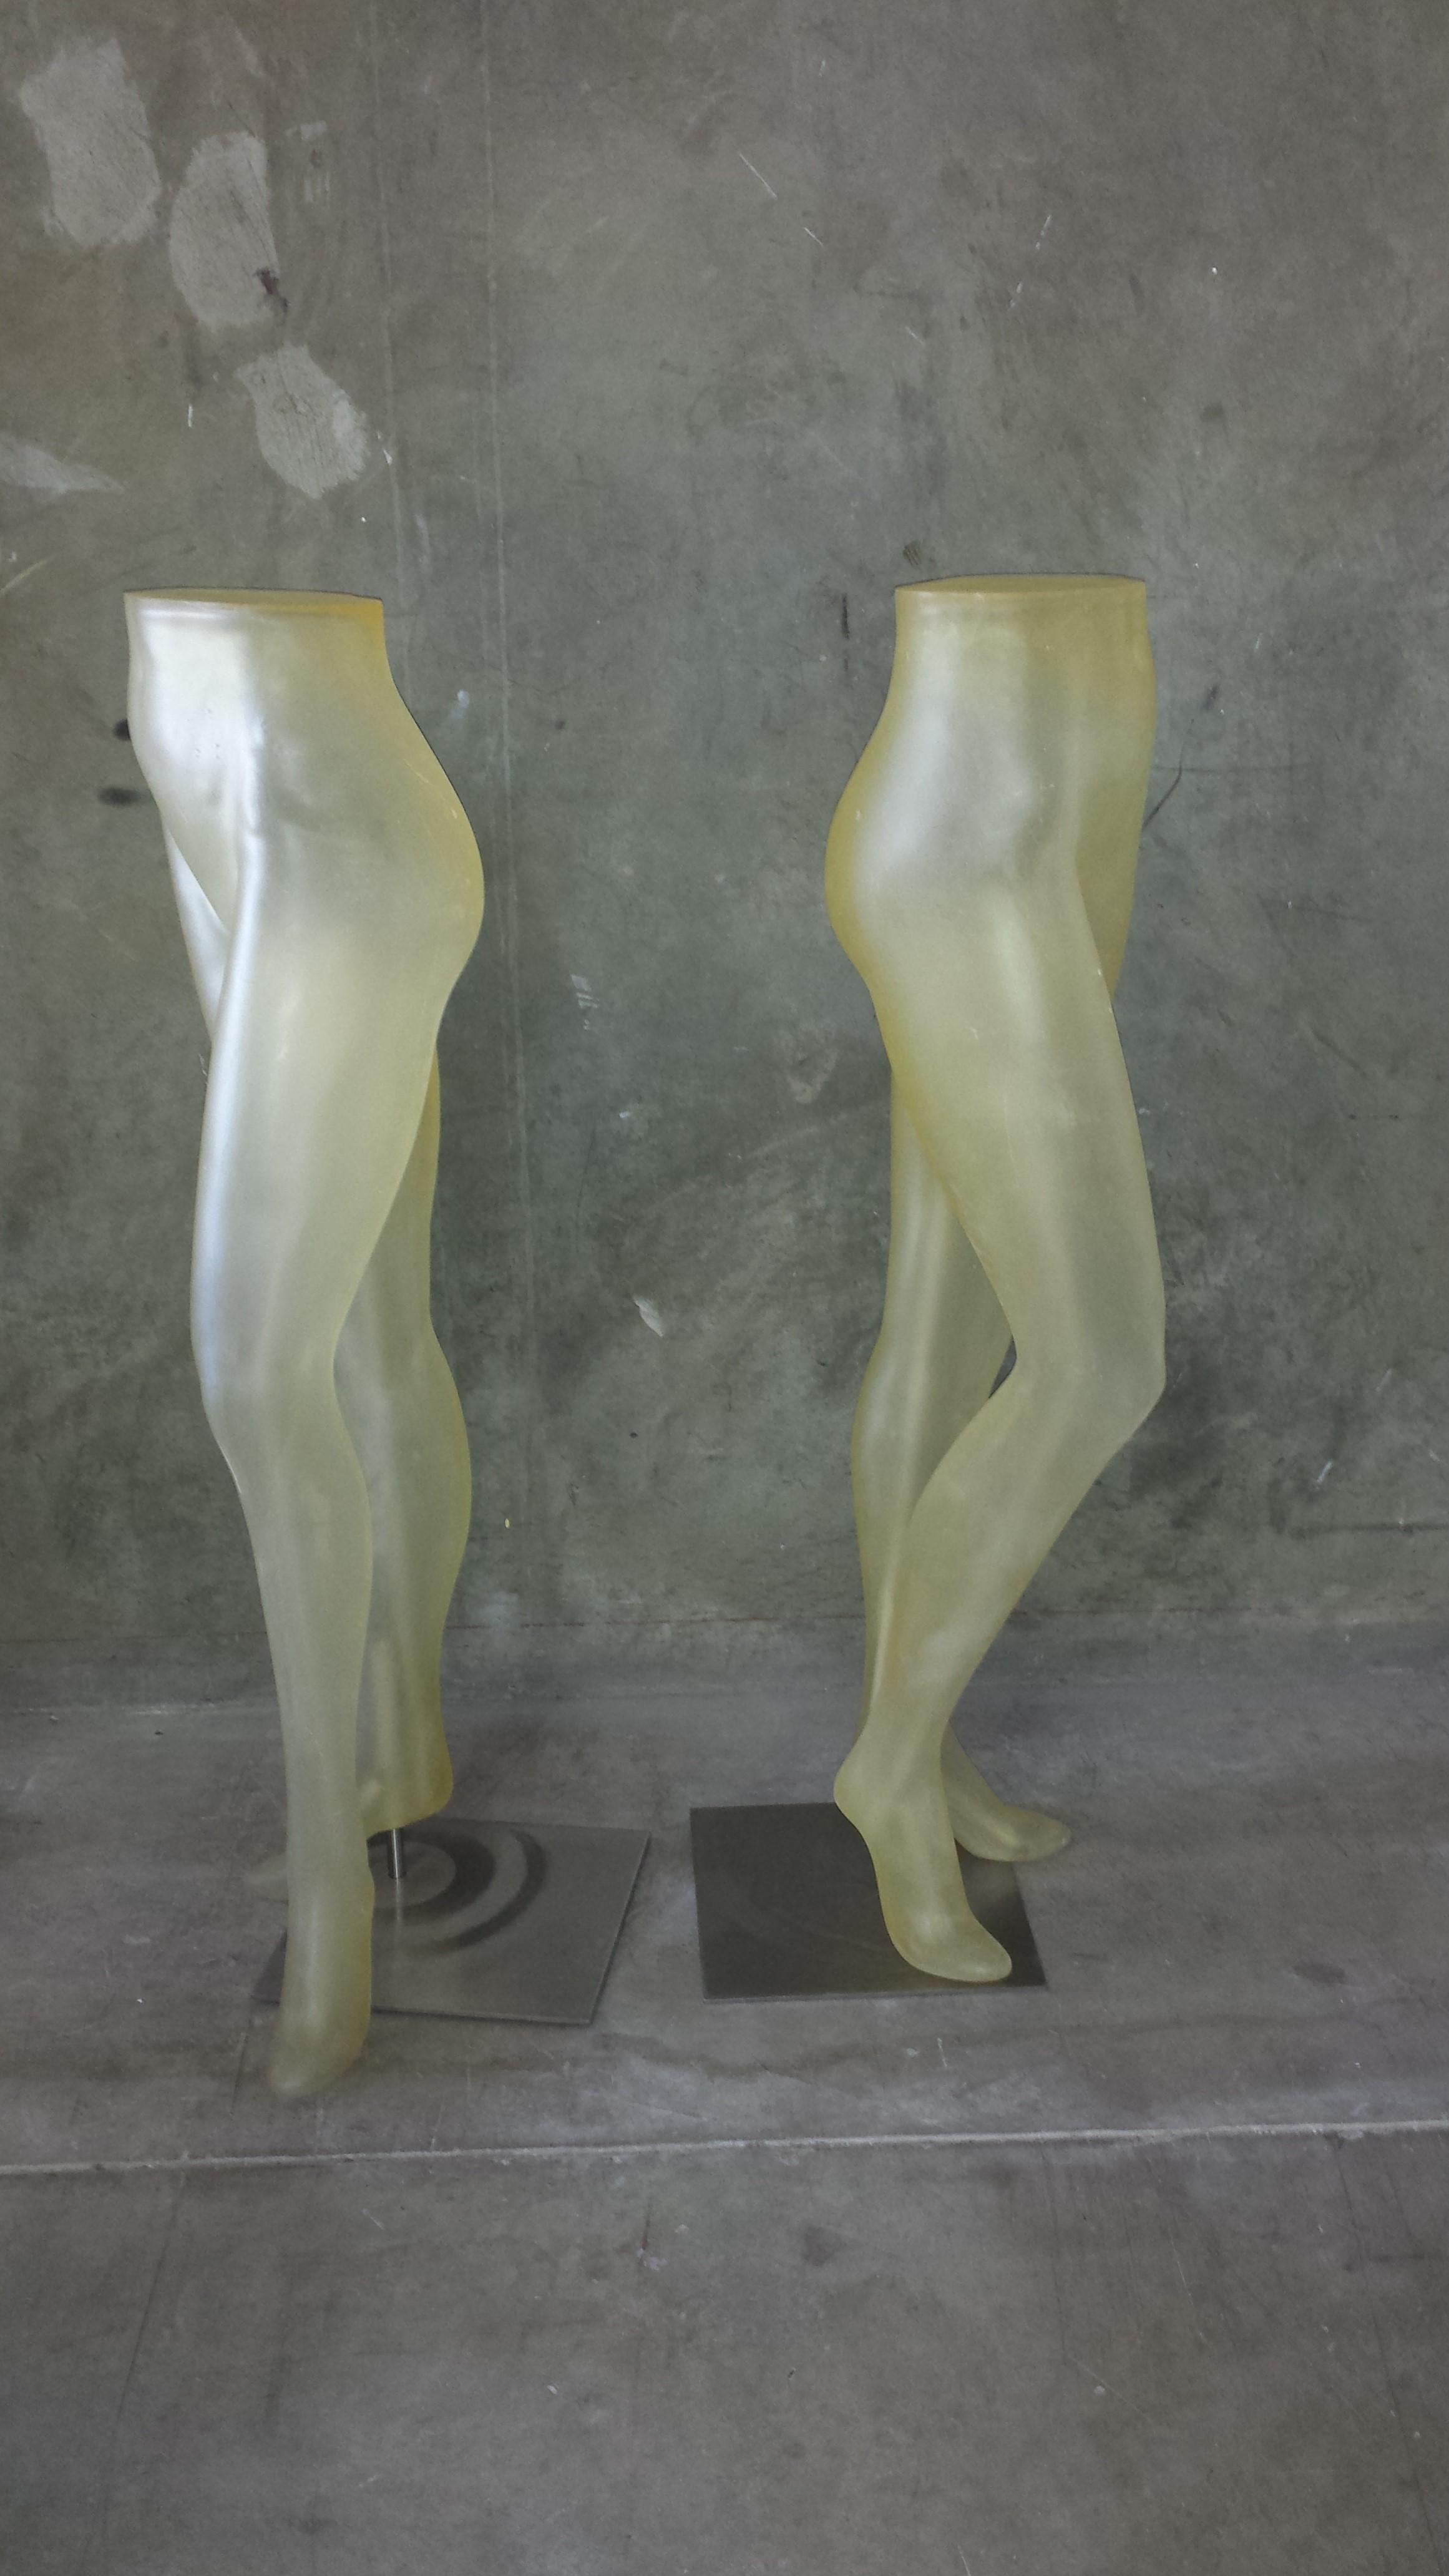 Translucent Pants Forms